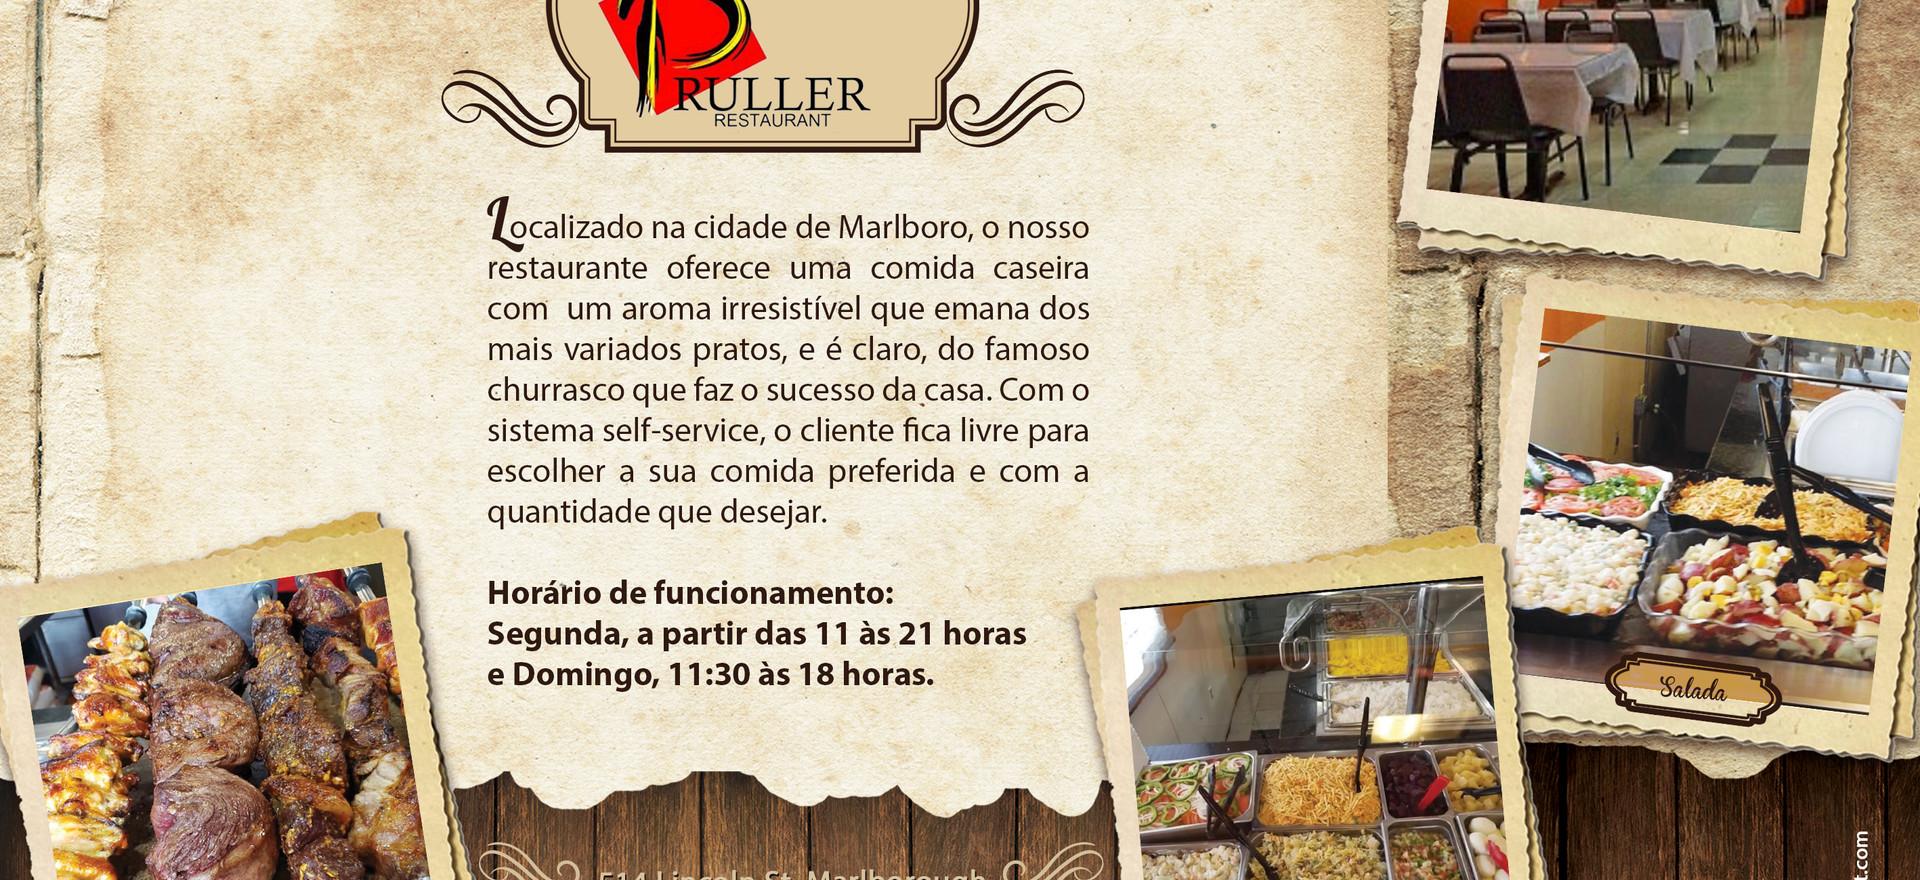 Pruller_AD_HALFPAGE_2_copy.jpg